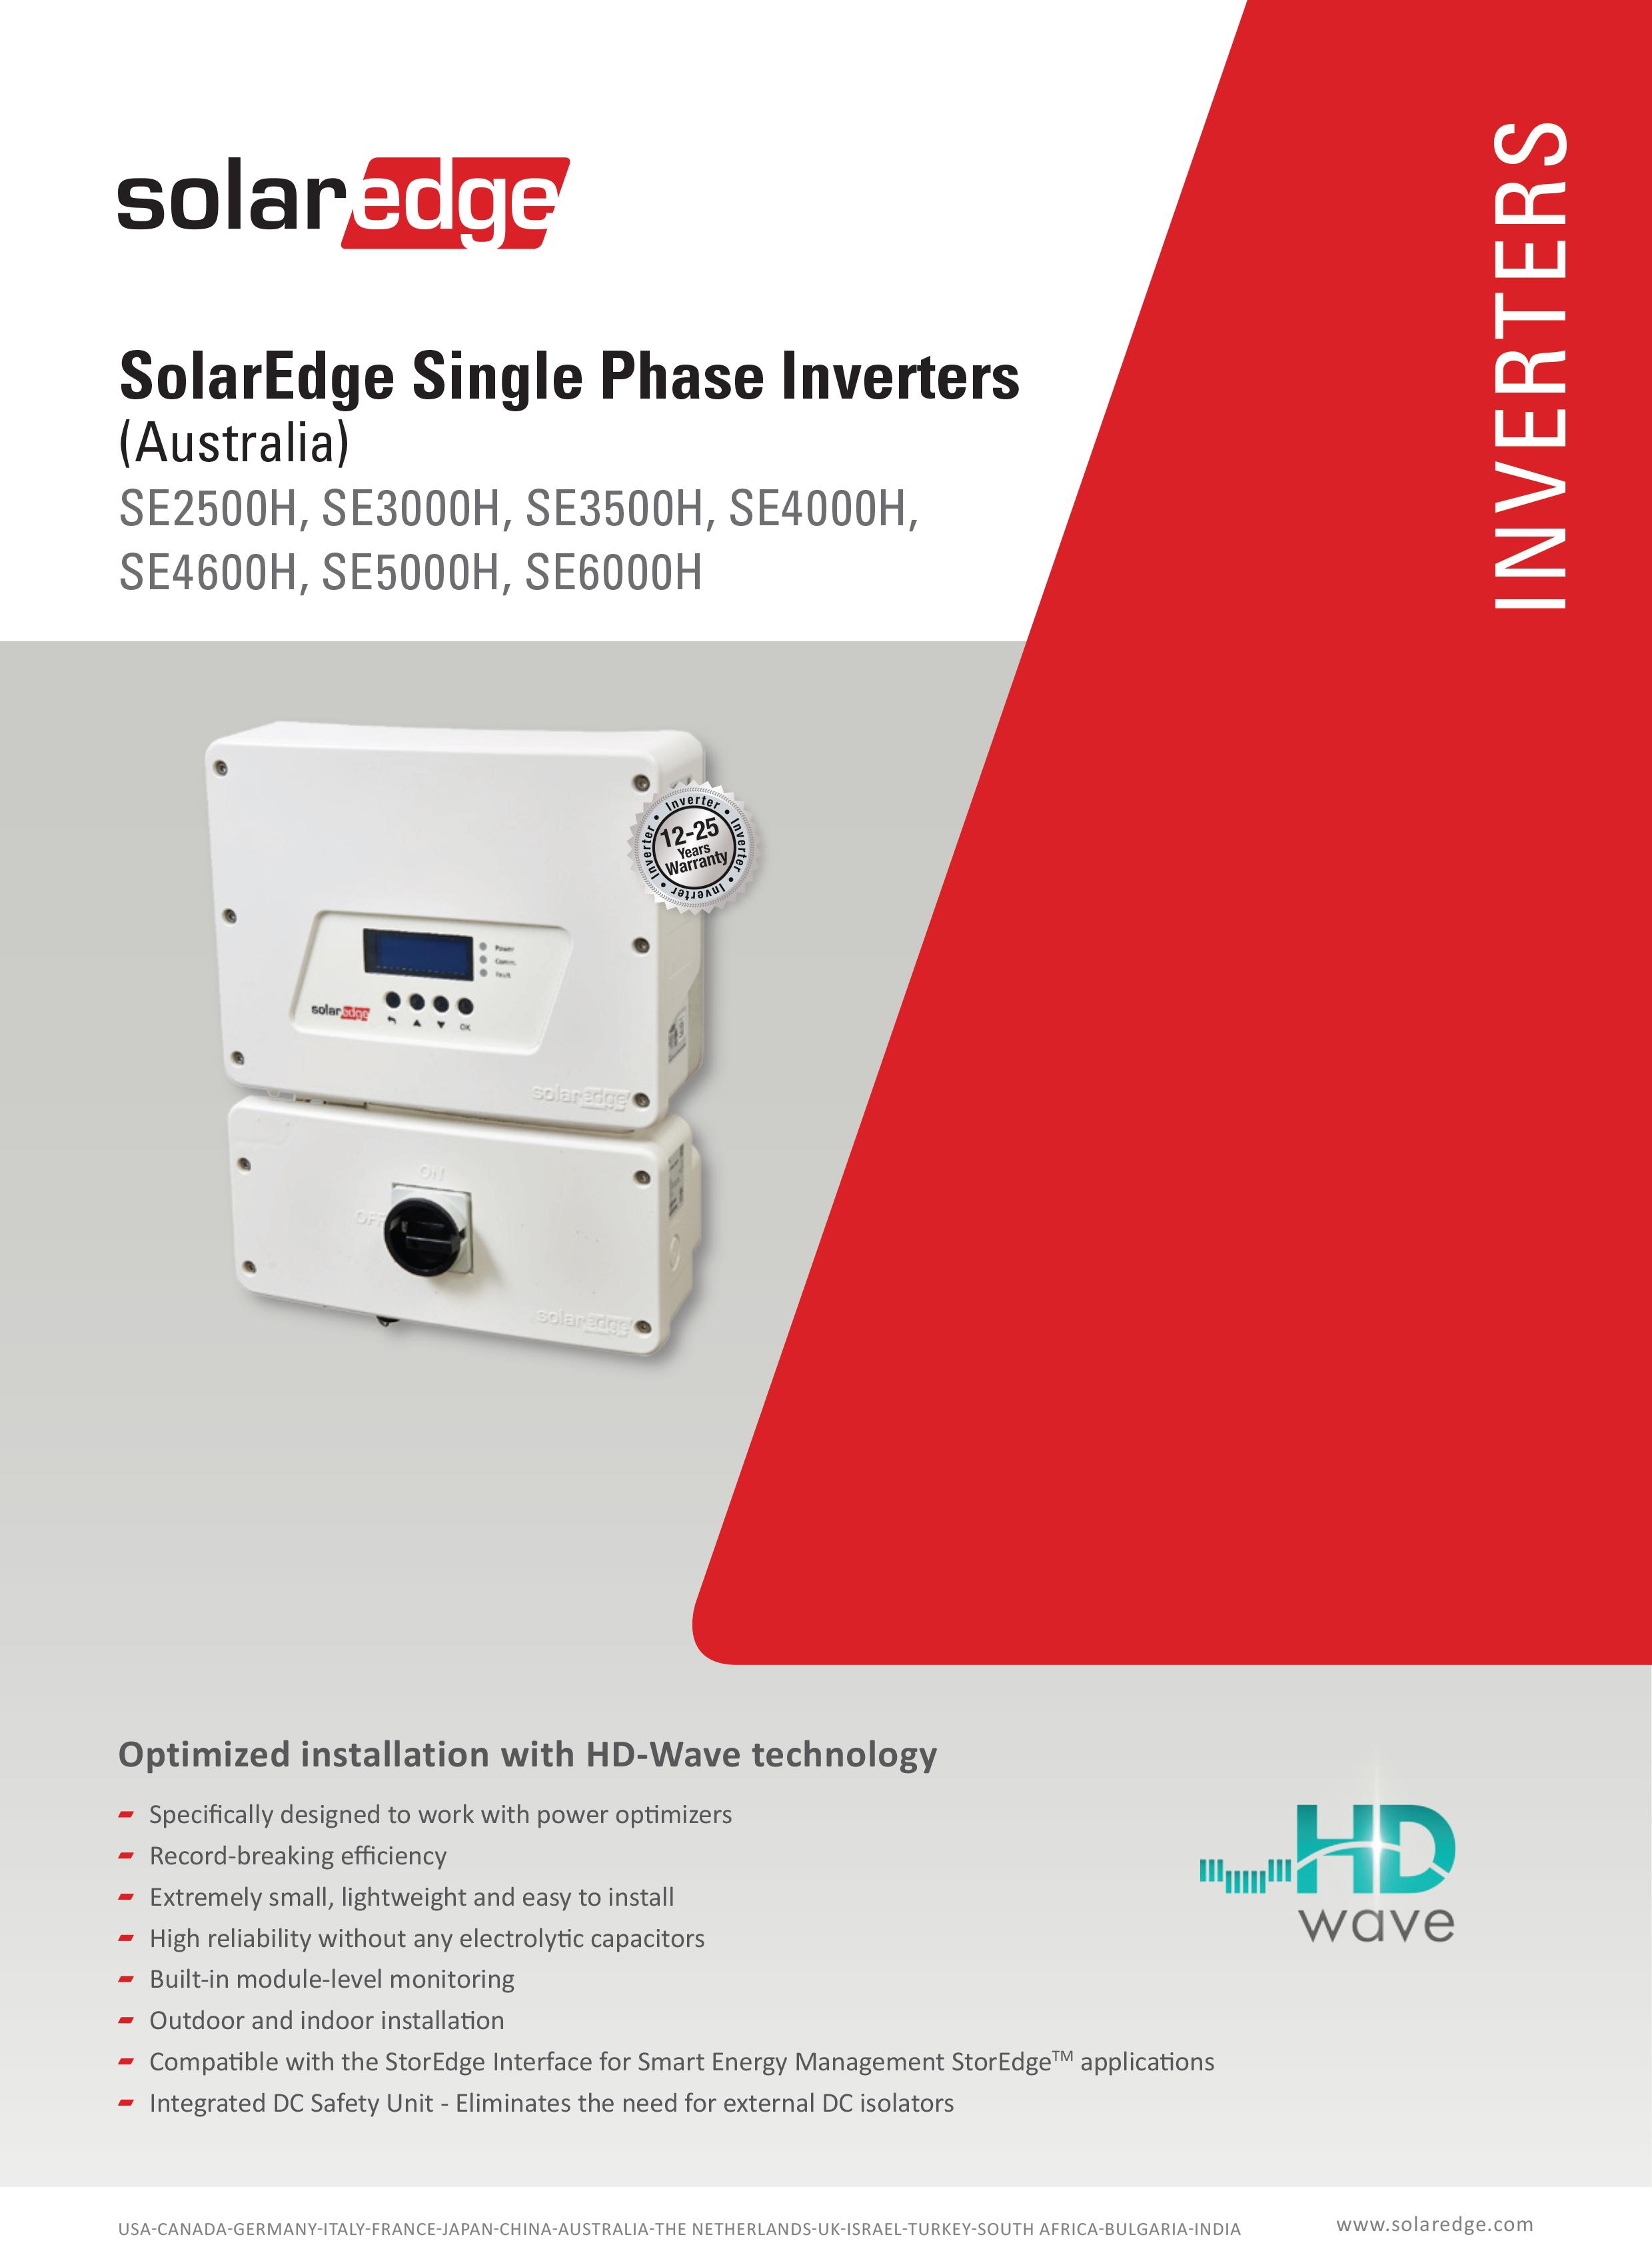 solaredge-single-phase-HD-wave-inverter-datasheet-aus-1.jpg